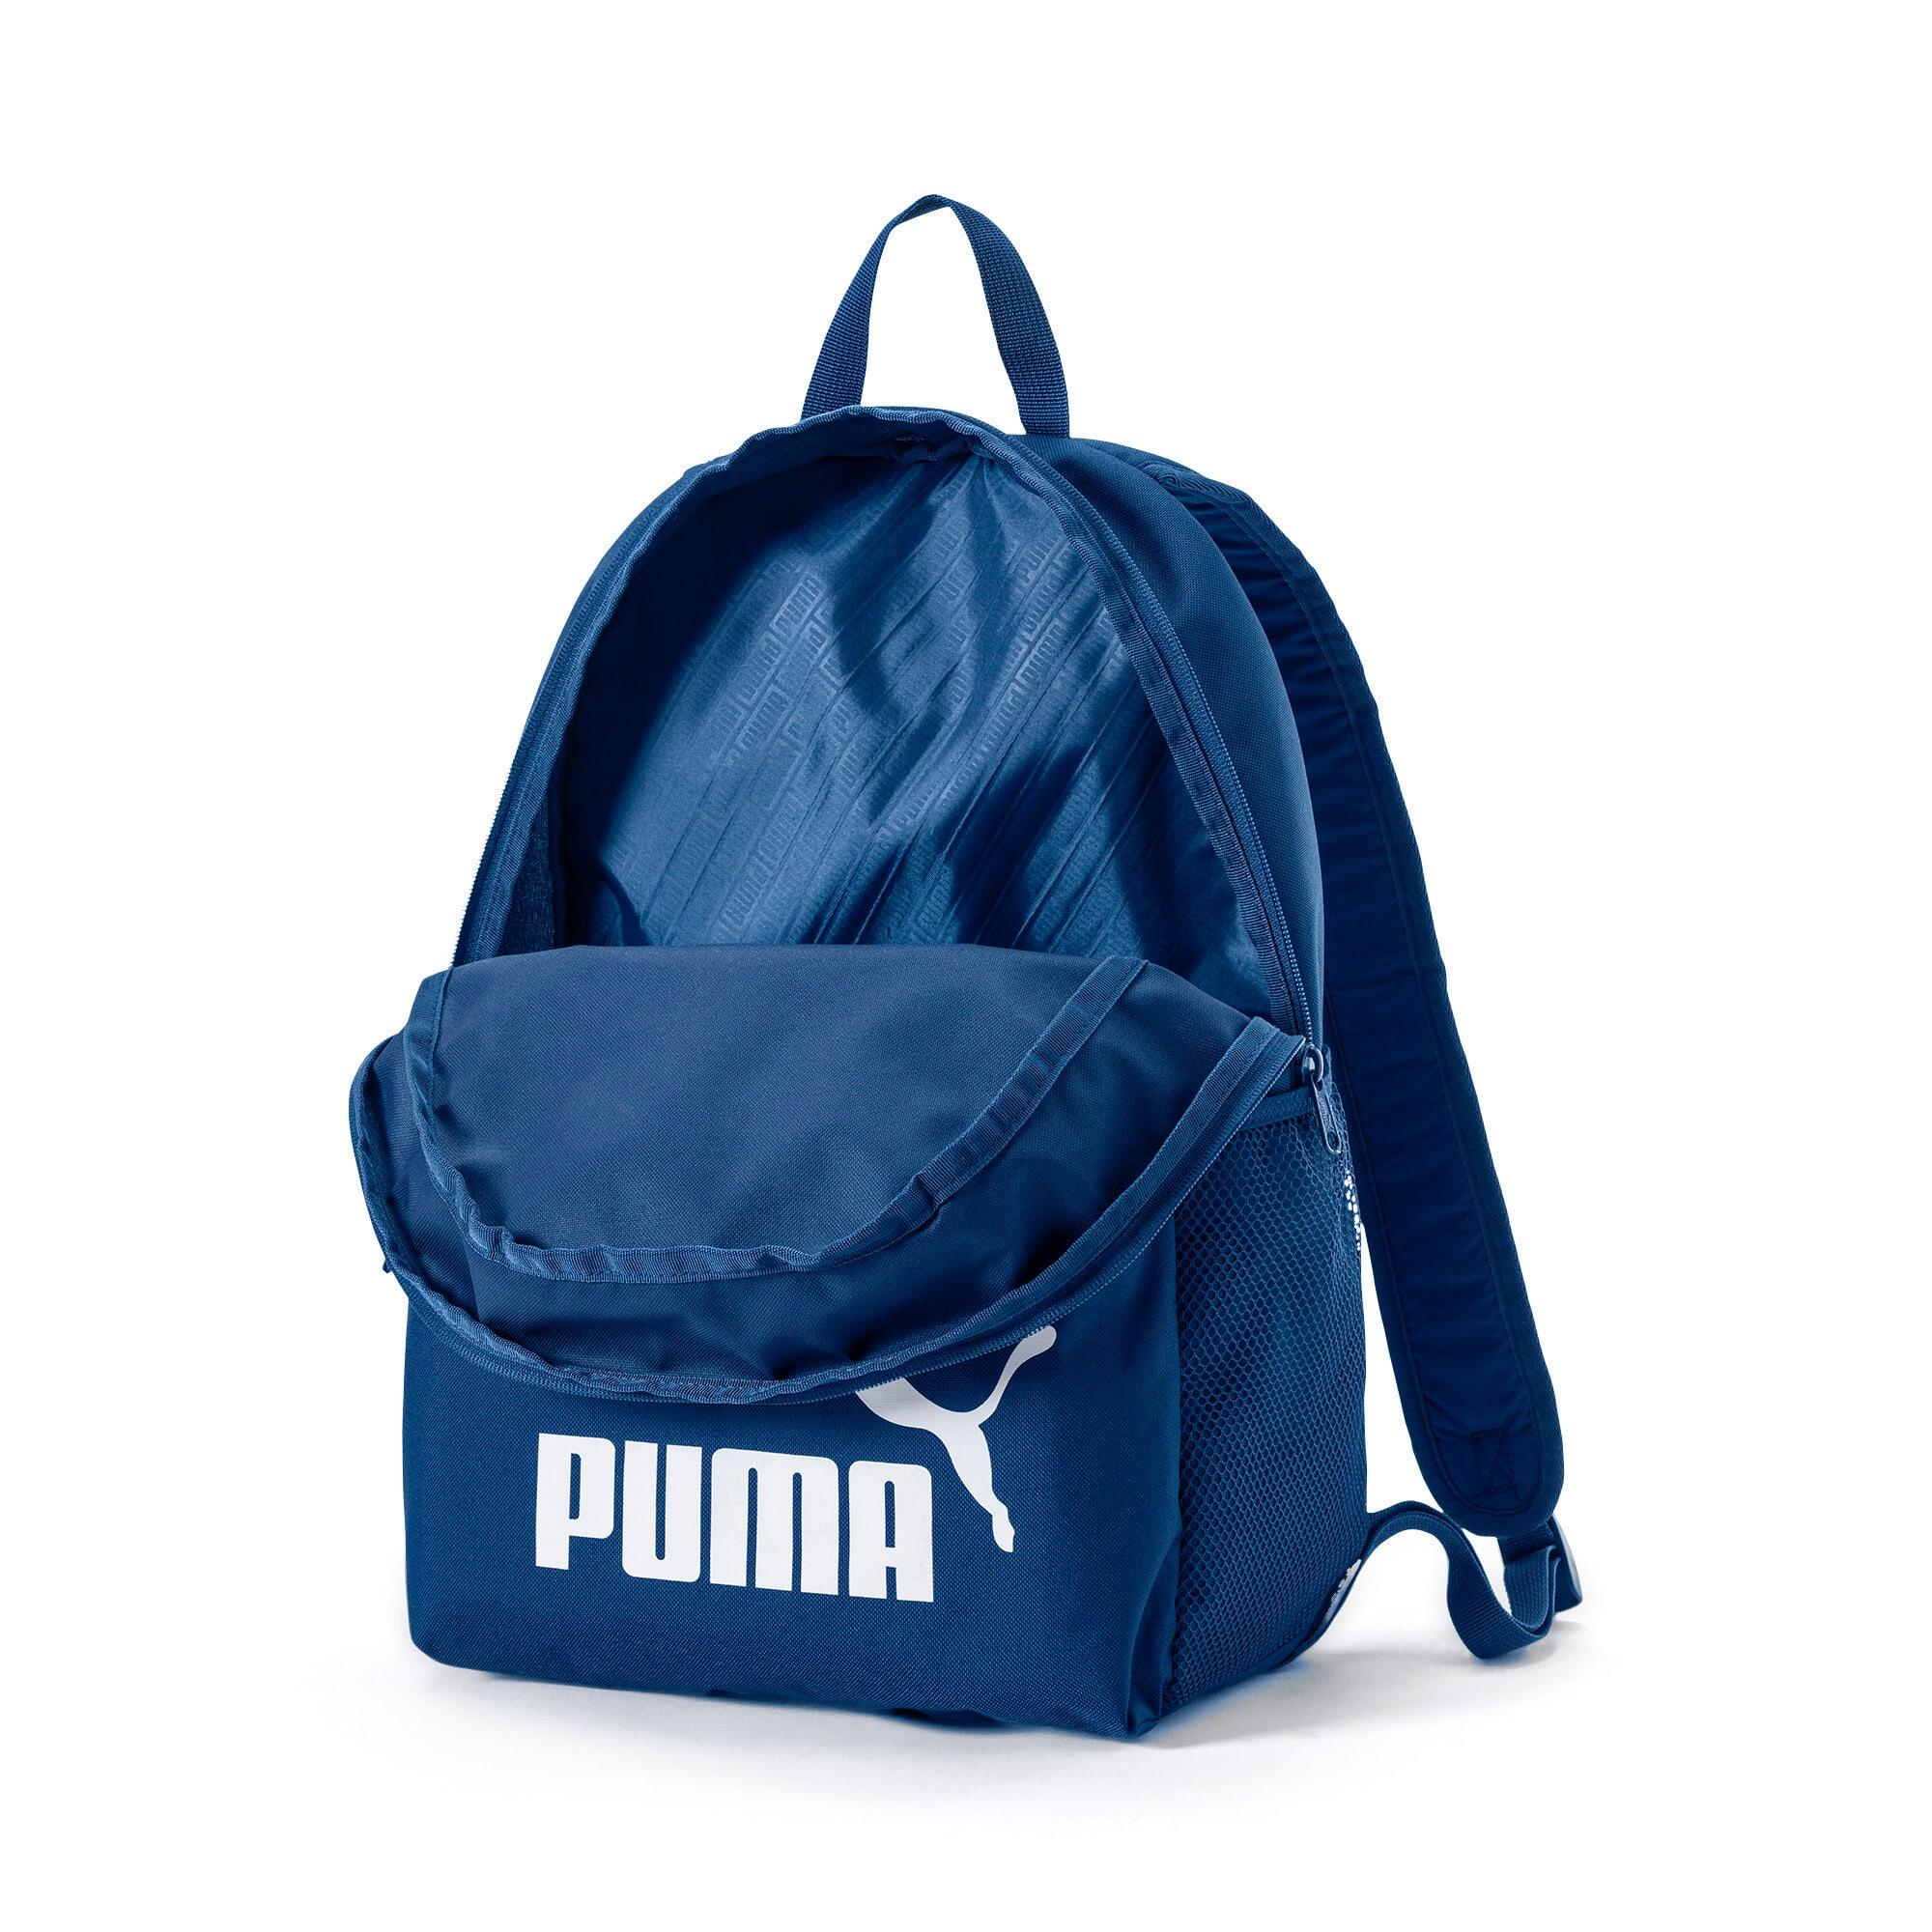 Thumbnail 3 of Phase Backpack, Limoges, medium-IND